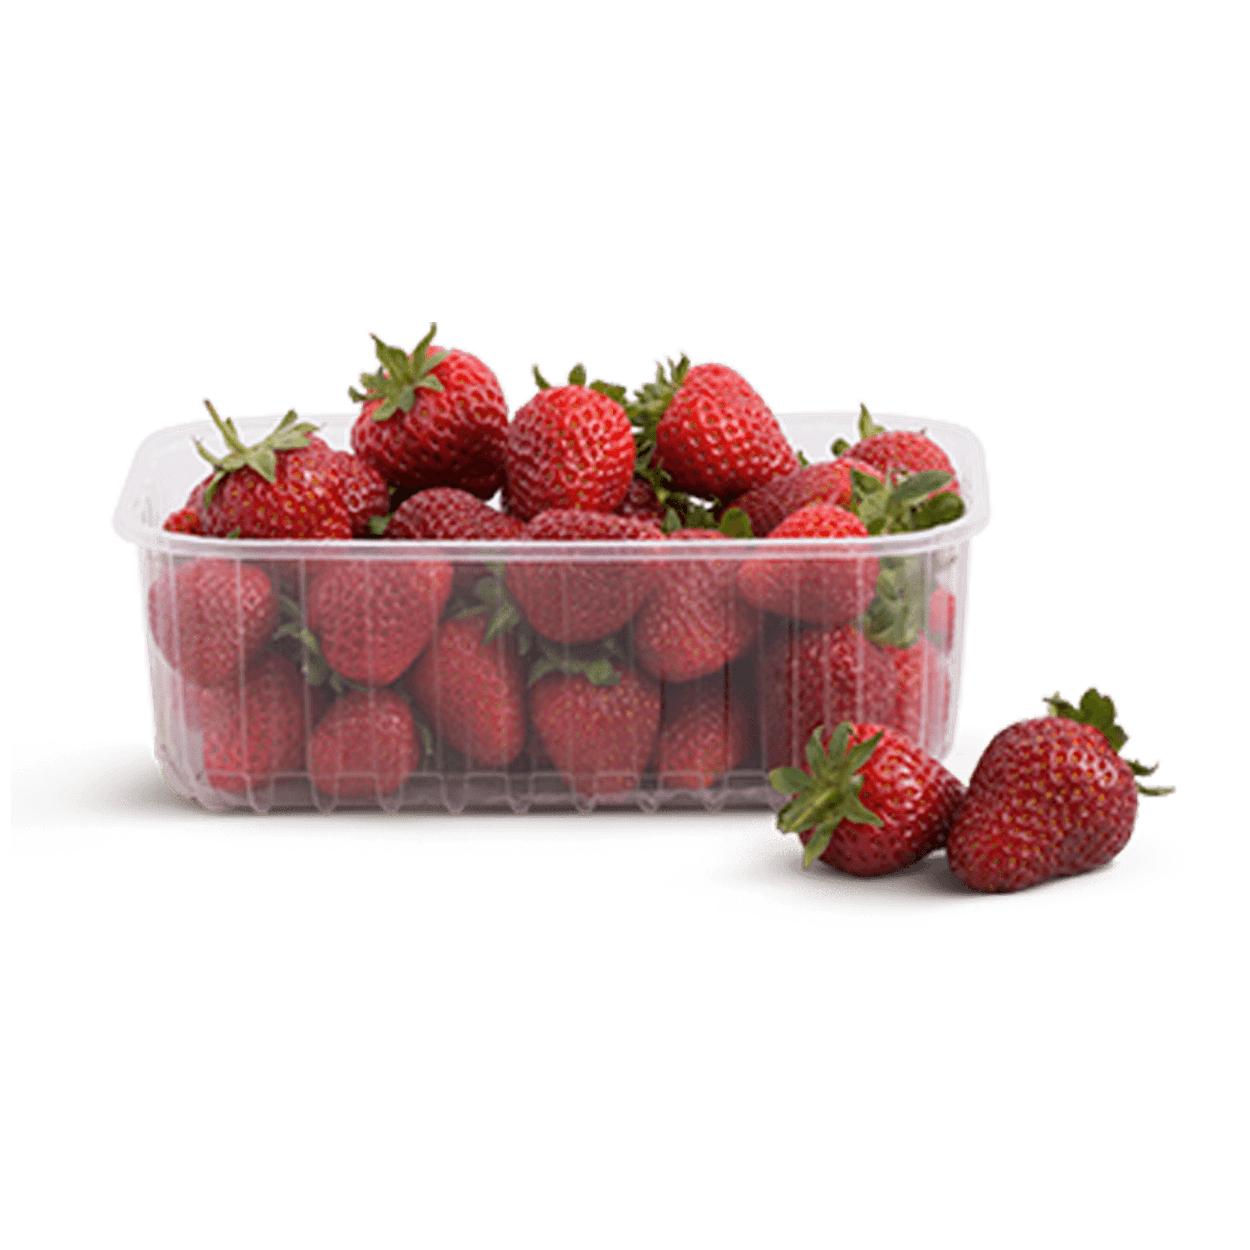 Fresas 1kg por 1.99